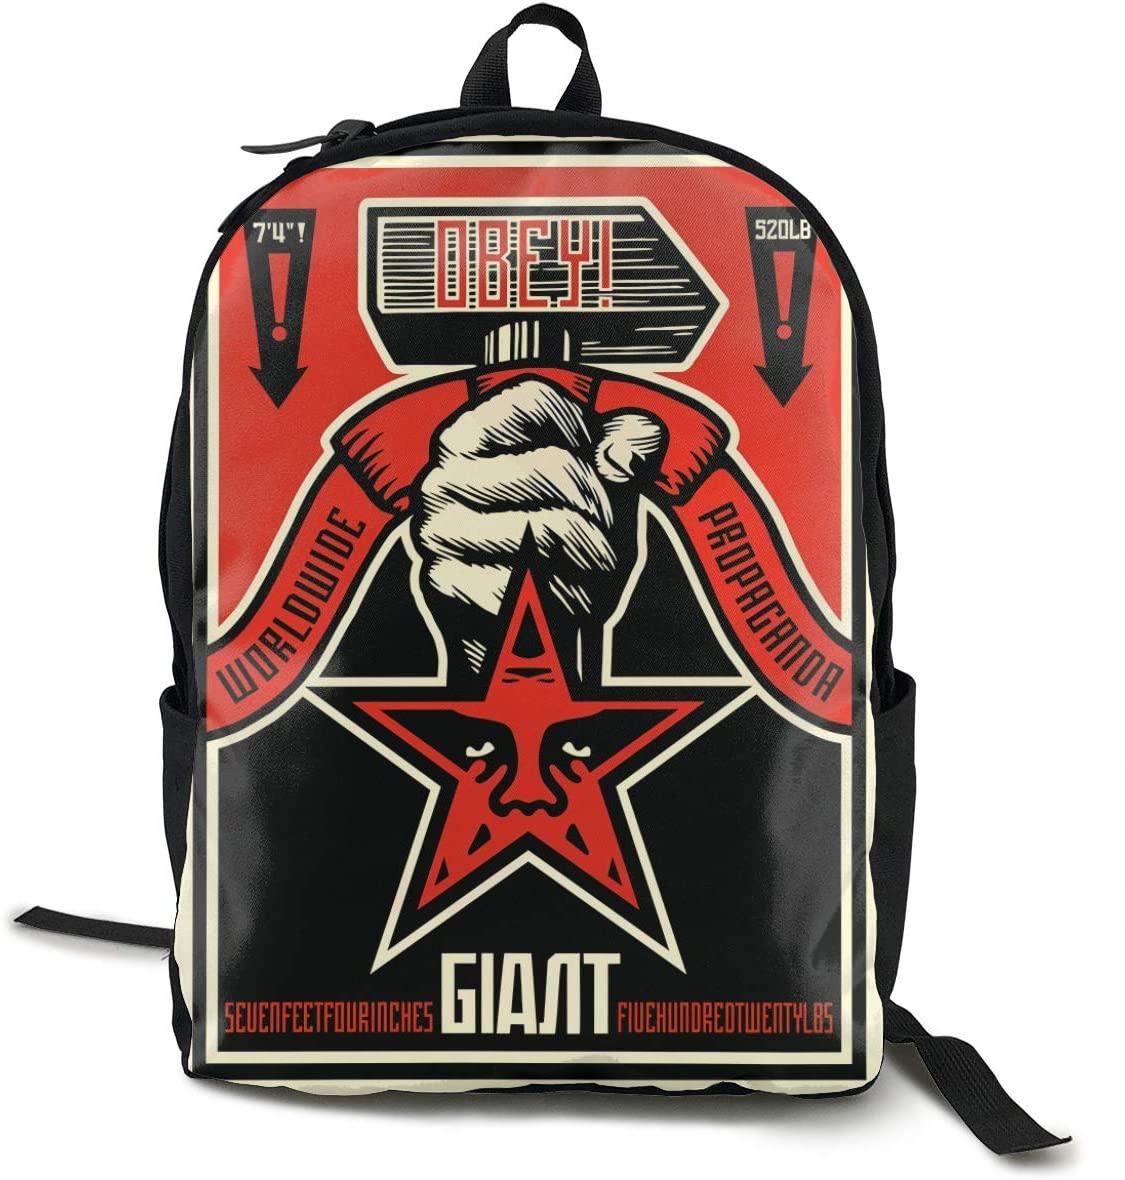 Wehoiweh Classic Obey-Propaganda Backpack School Bag Laptop Daypack Bookbagblack